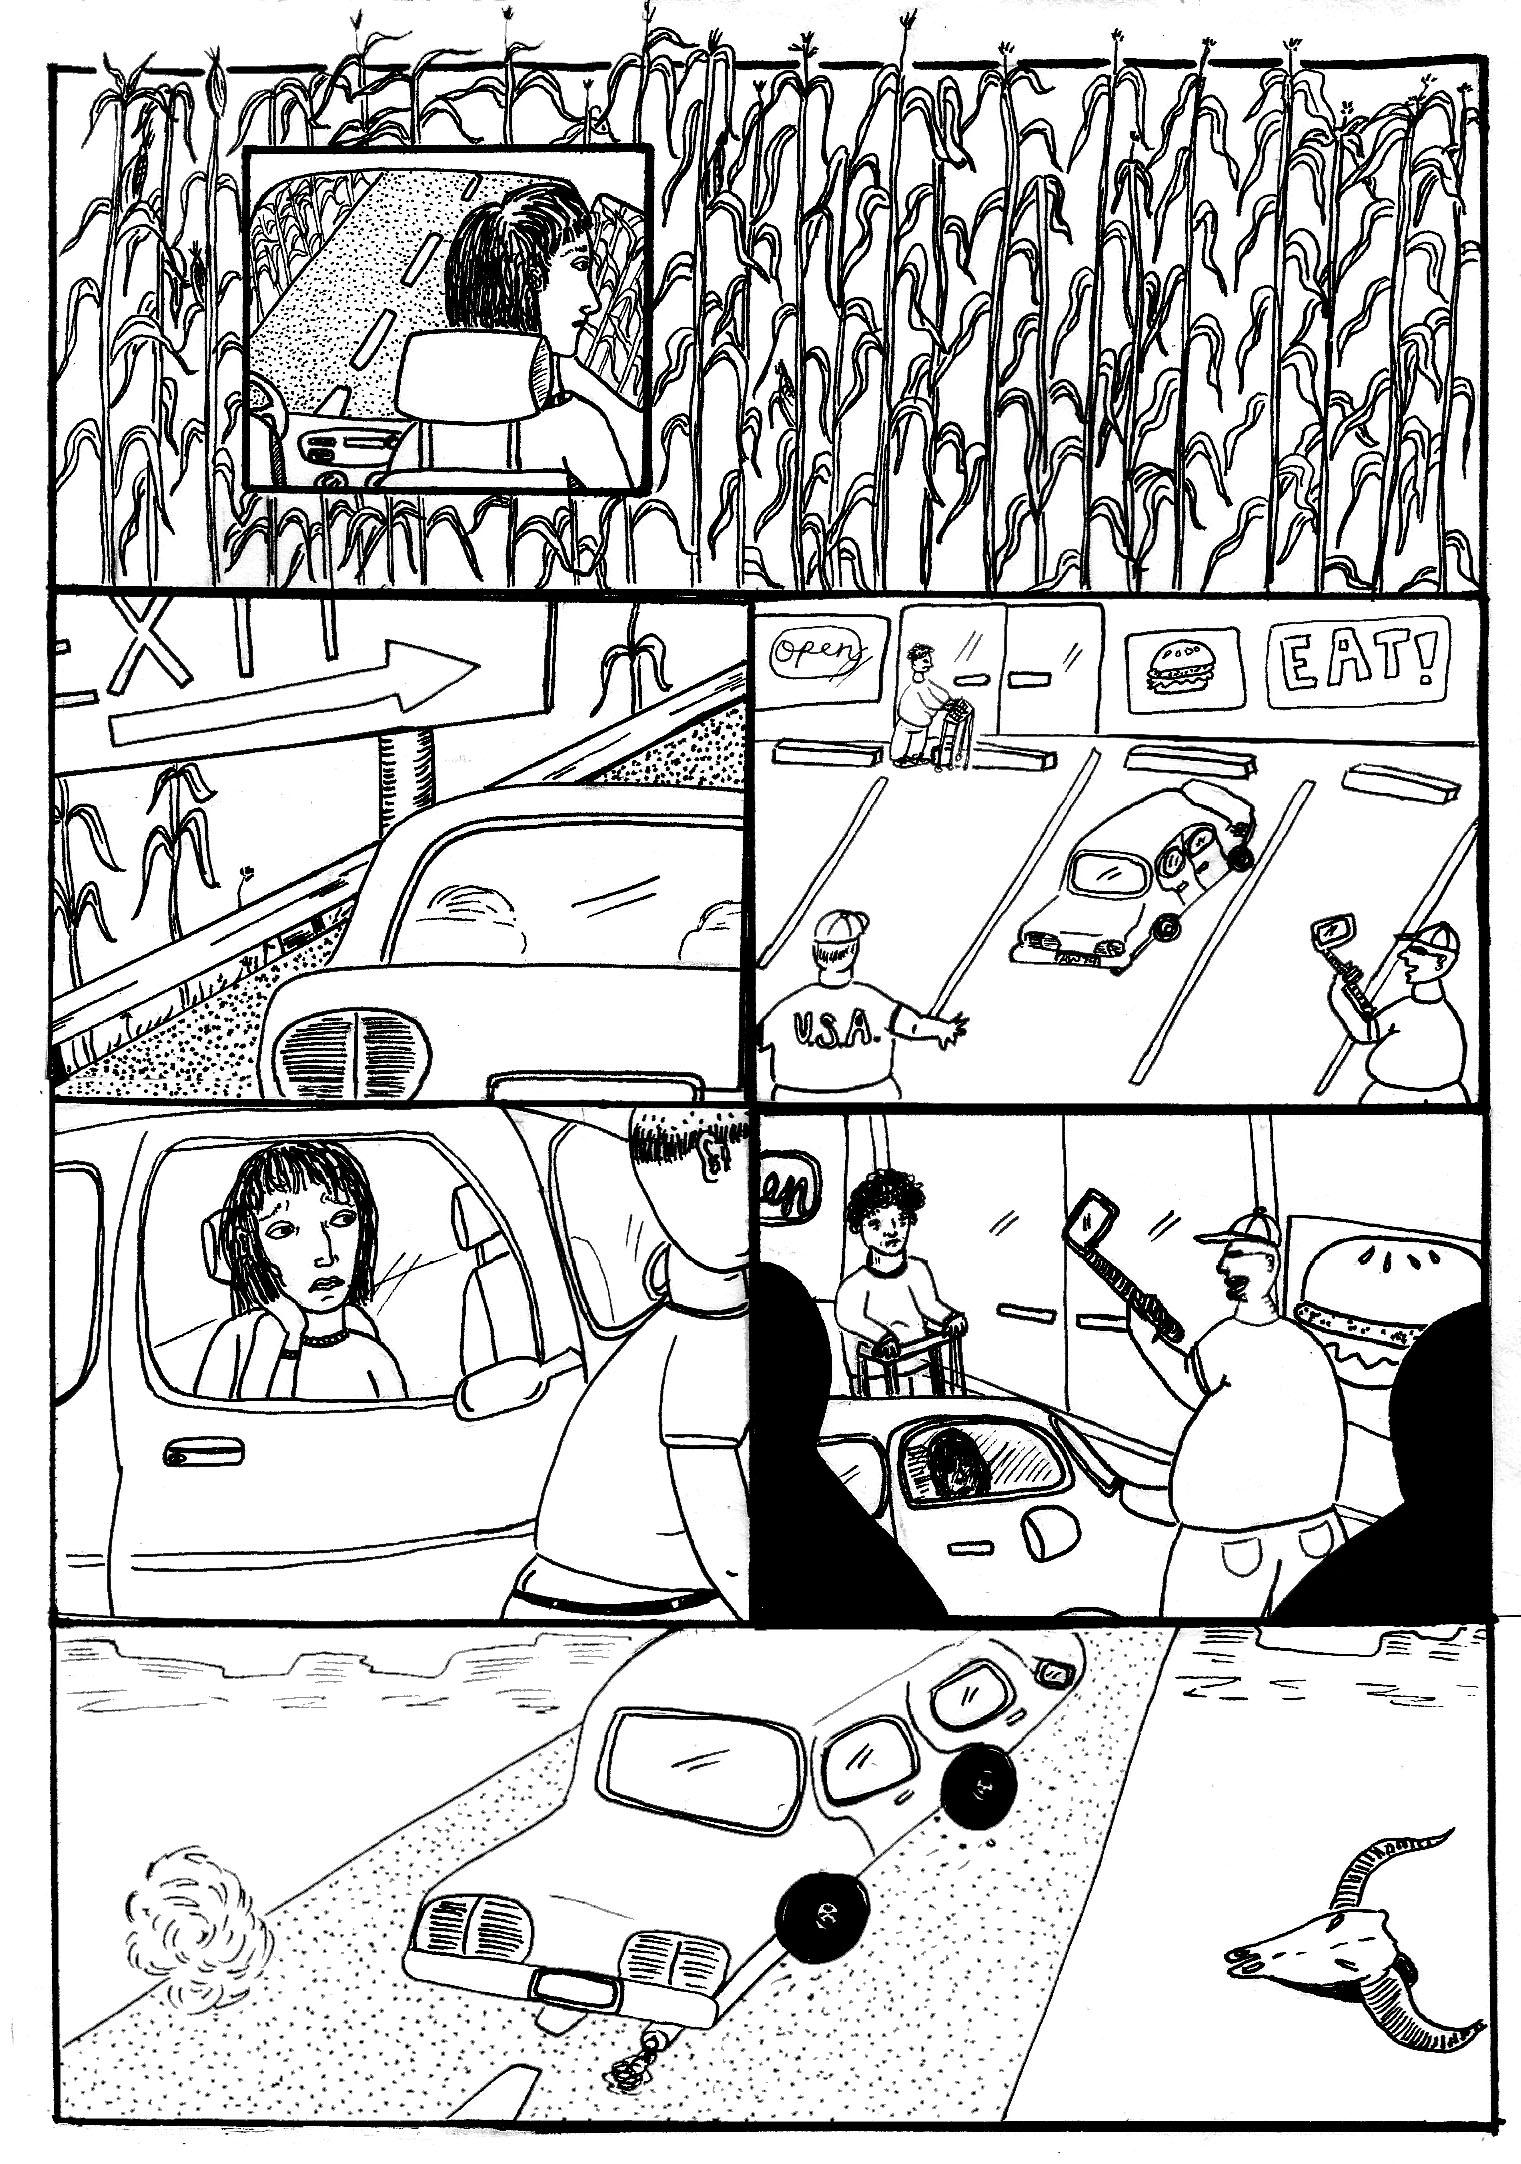 badlands comic.jpg